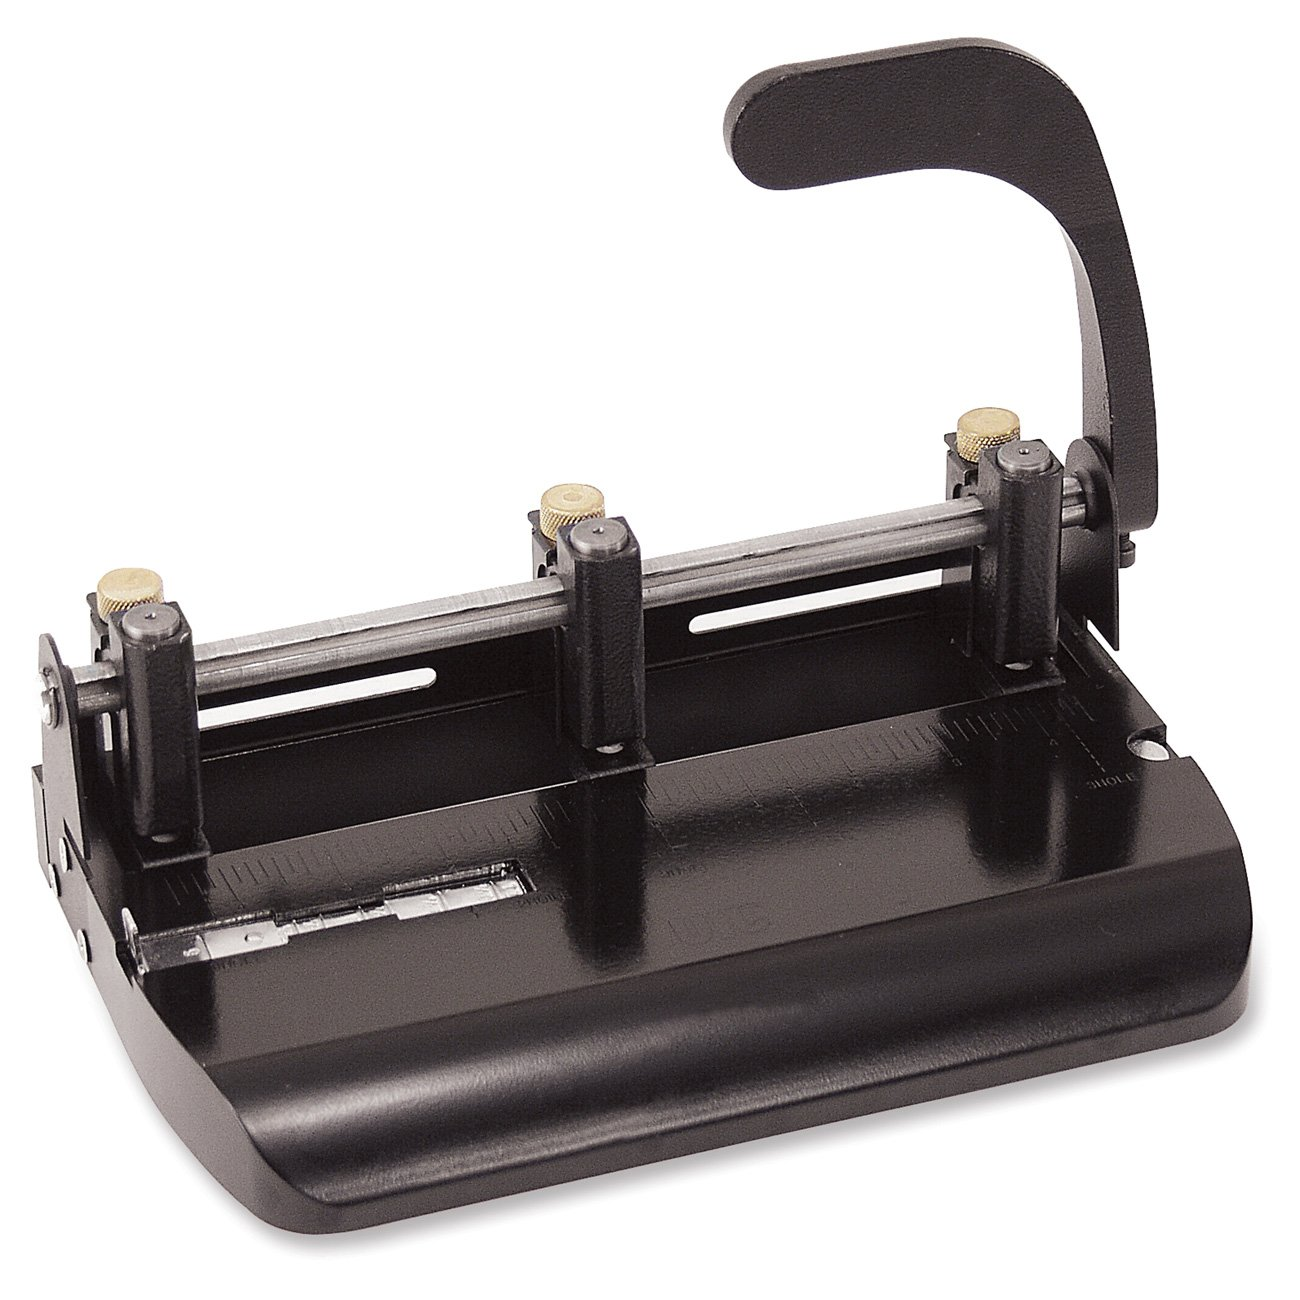 Perforadora Hasta 32 Hojas 2/3 Agujeros Distancia Ajustable